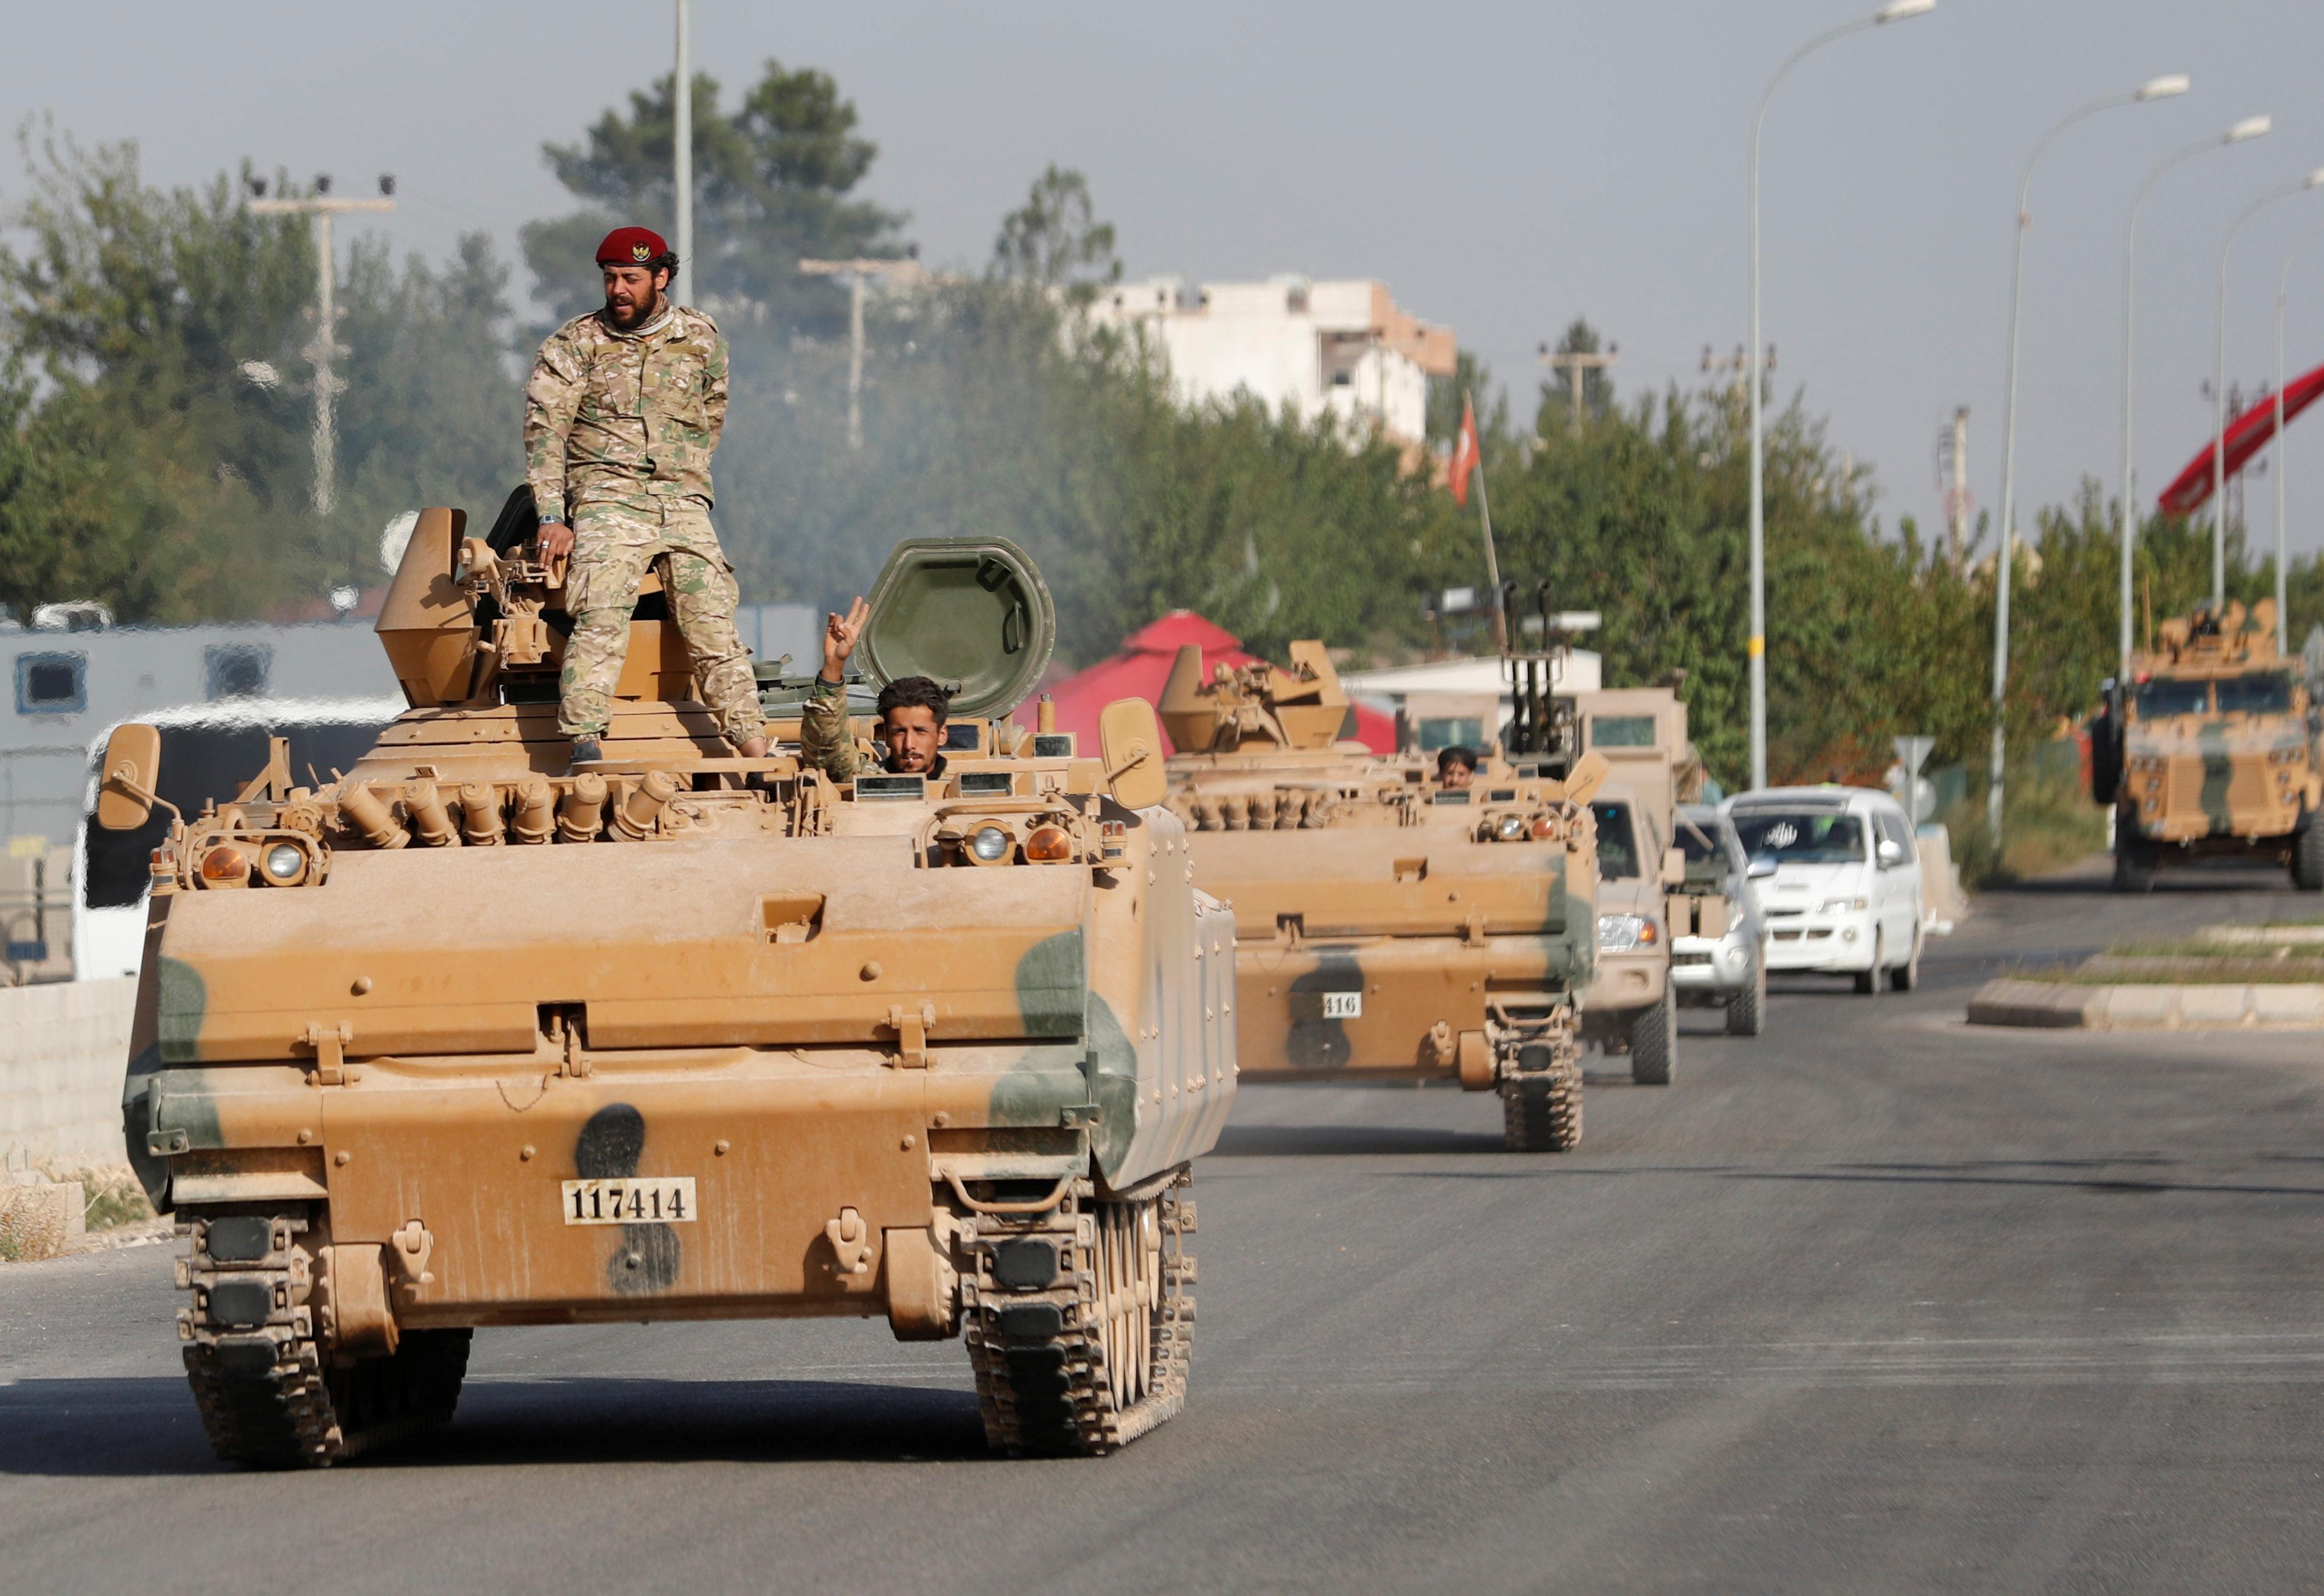 Furious with Turkey, EU threatens sanctions, arms embargo